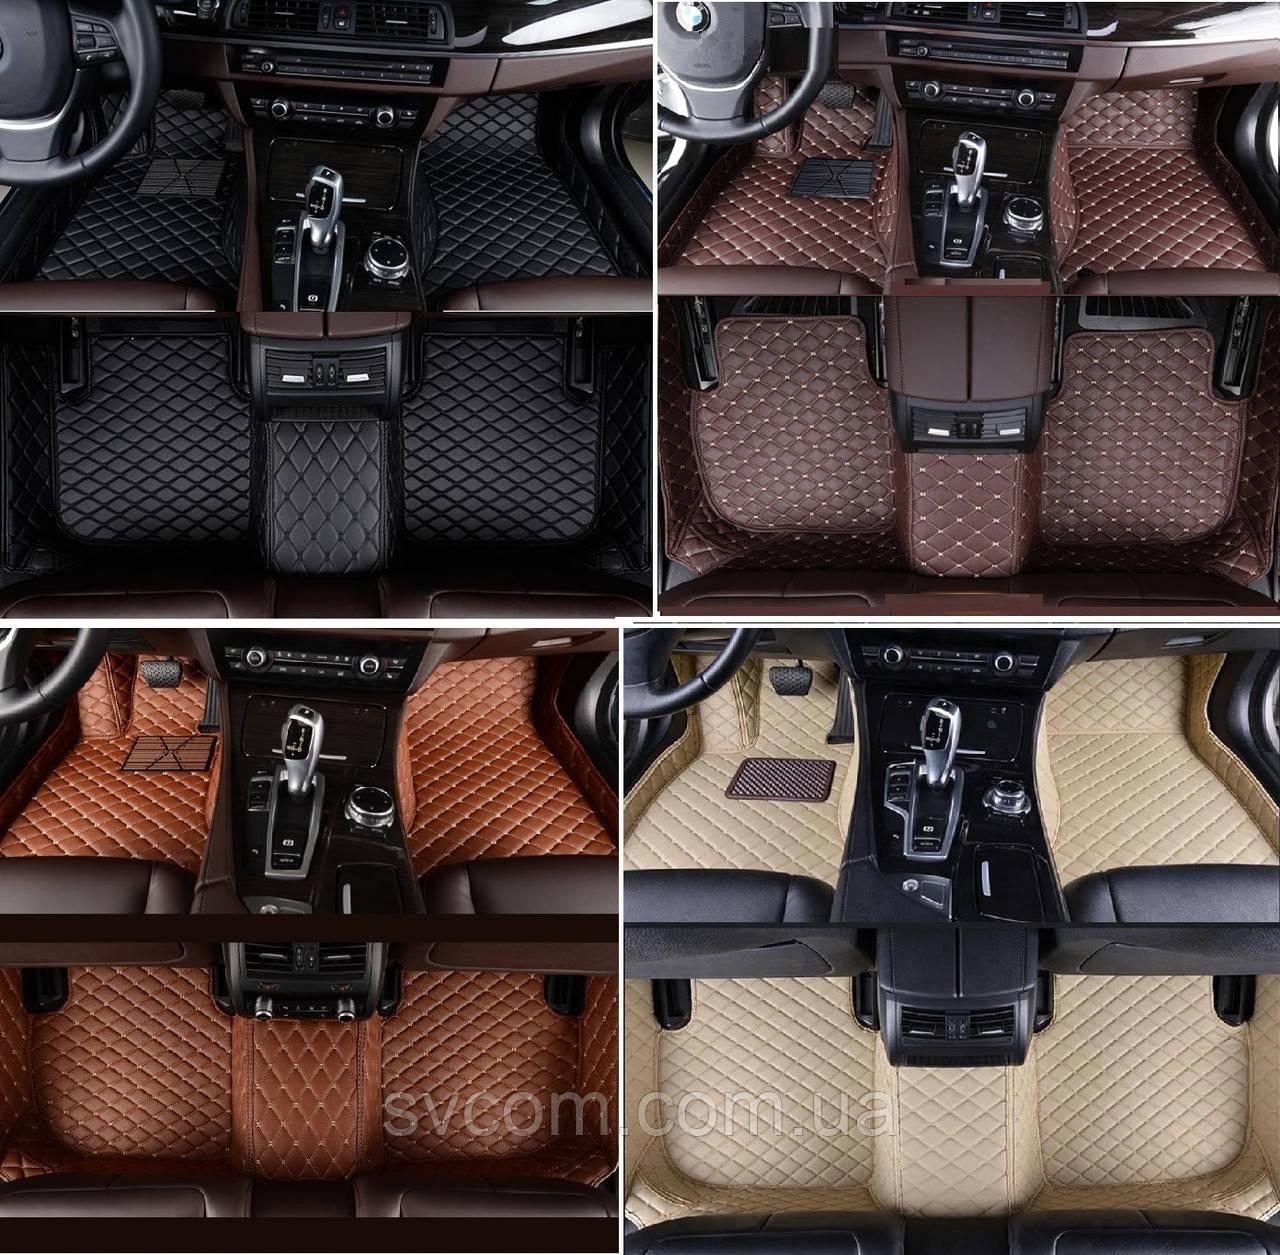 Кожаные Коврики на Jeep Grand Cherokee WK2 из Экокожи 3D (2010-2017) Коврики Джип Гранд Чероки